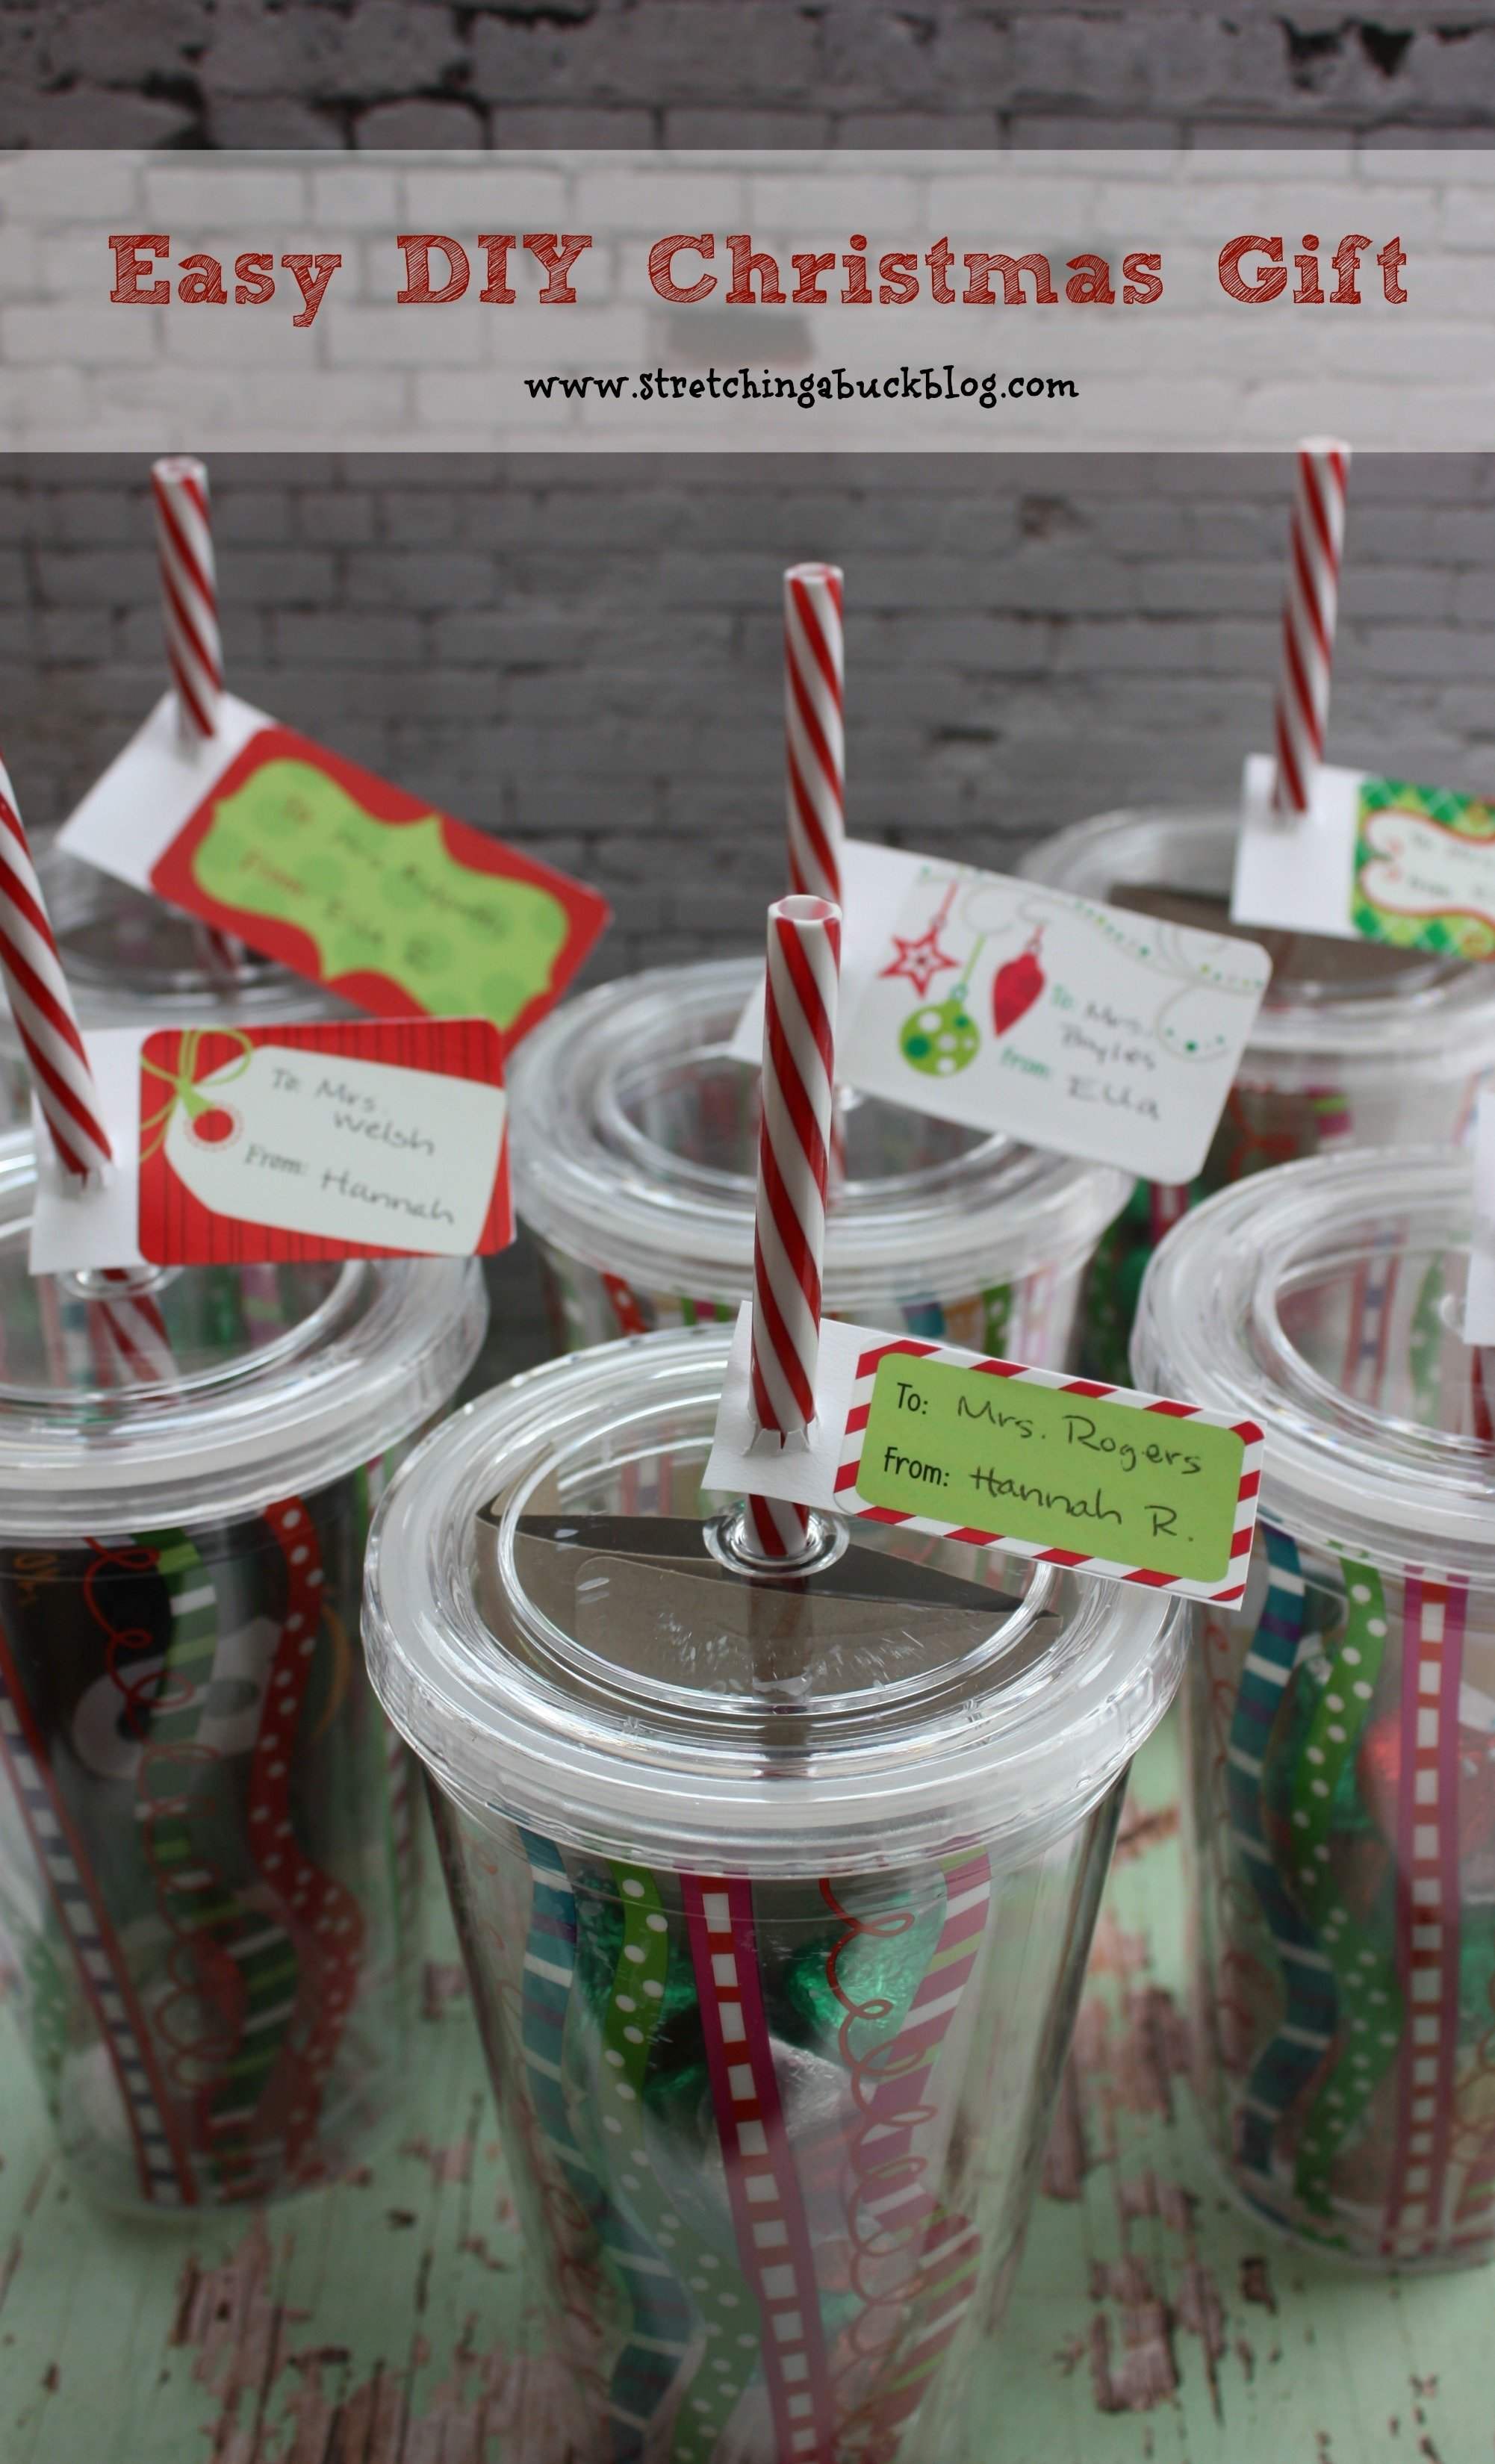 10 Great Gift Ideas For Teachers Christmas easy diy christmas gift idea for teachers friends more 1 2020